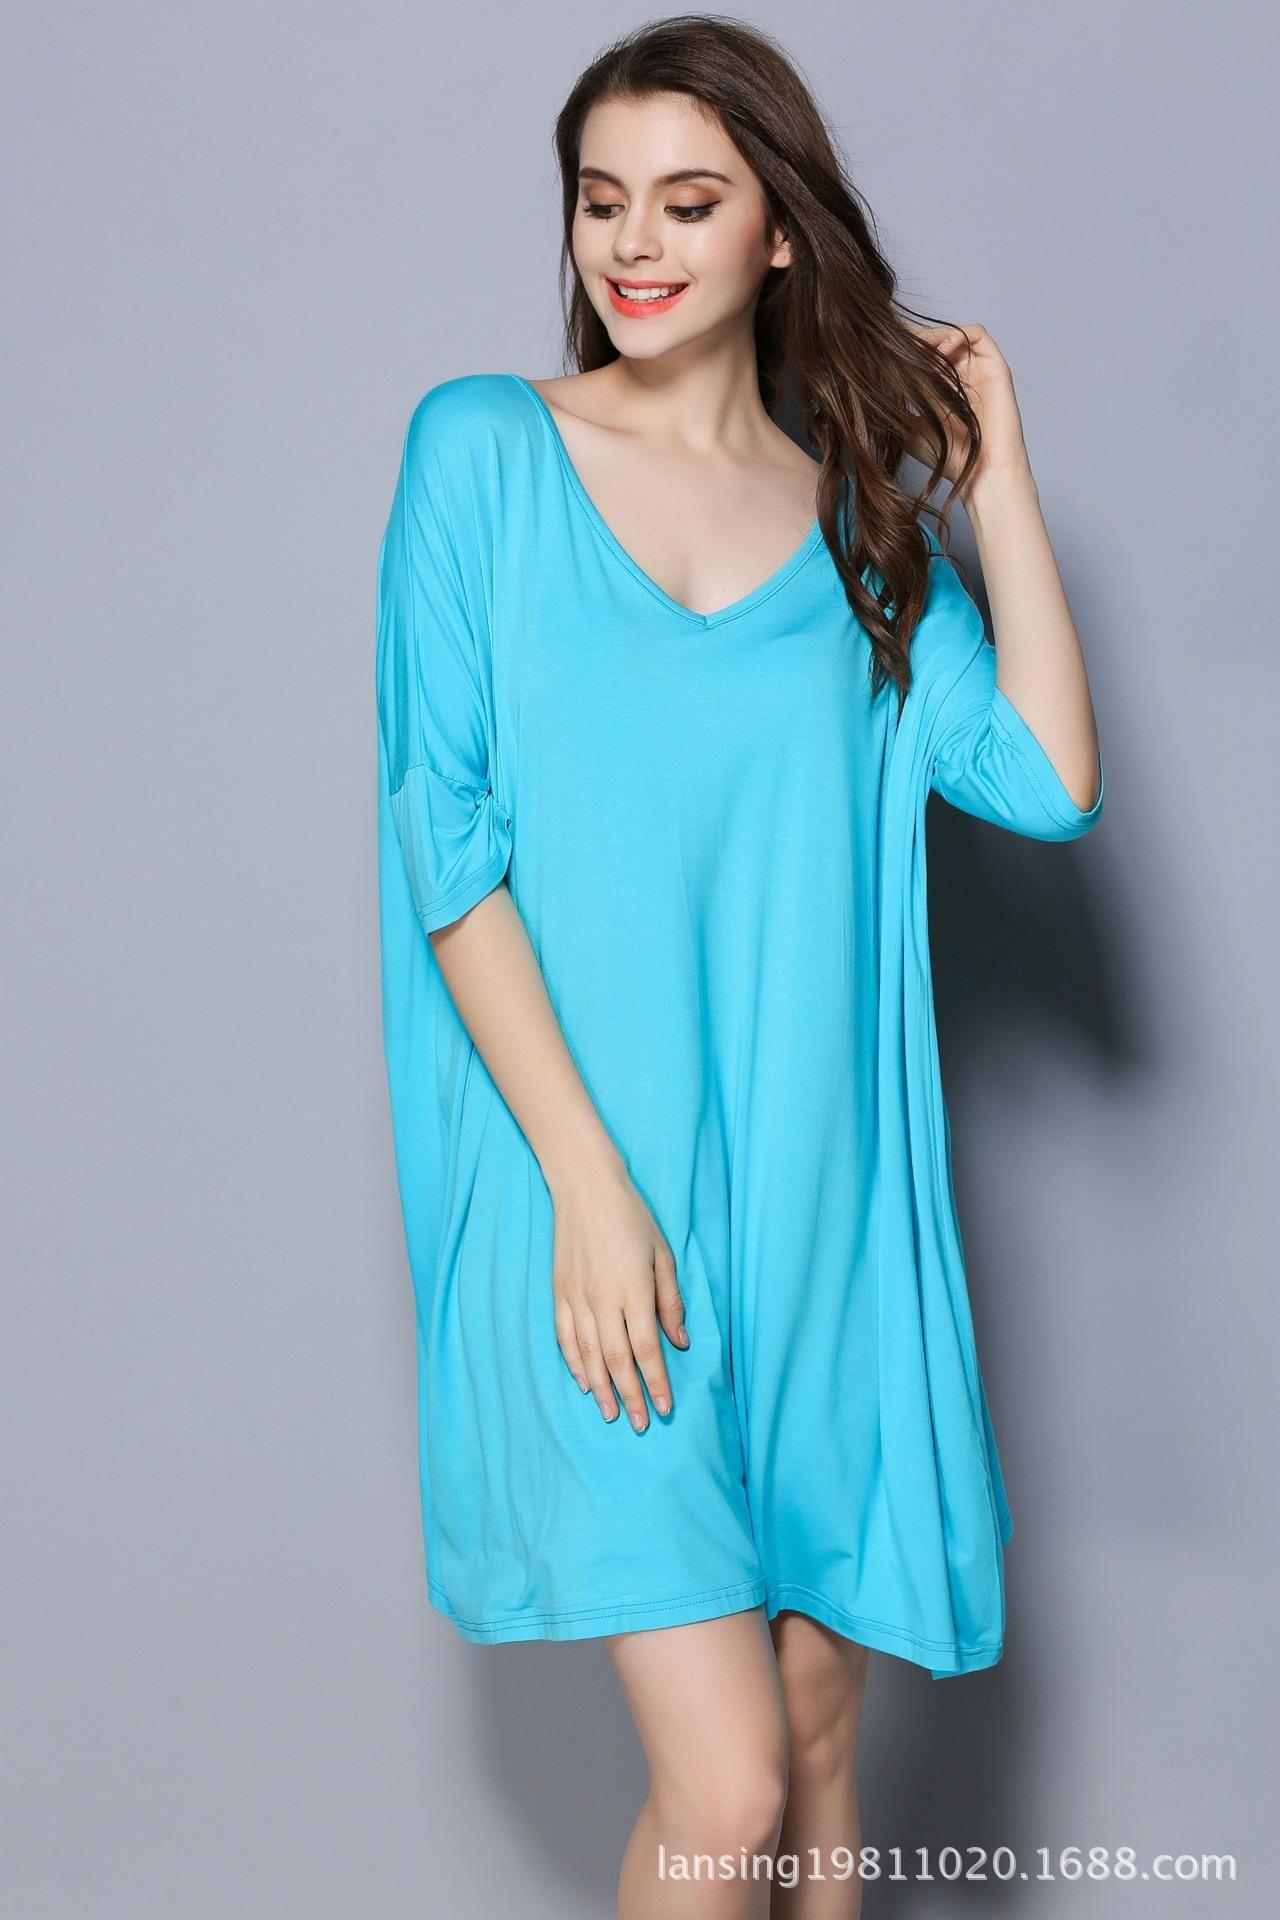 Nightdress spring and summer new medium and long T-shirt medium sleeve large size nightdress modal Pajama has fat plus size women good blue